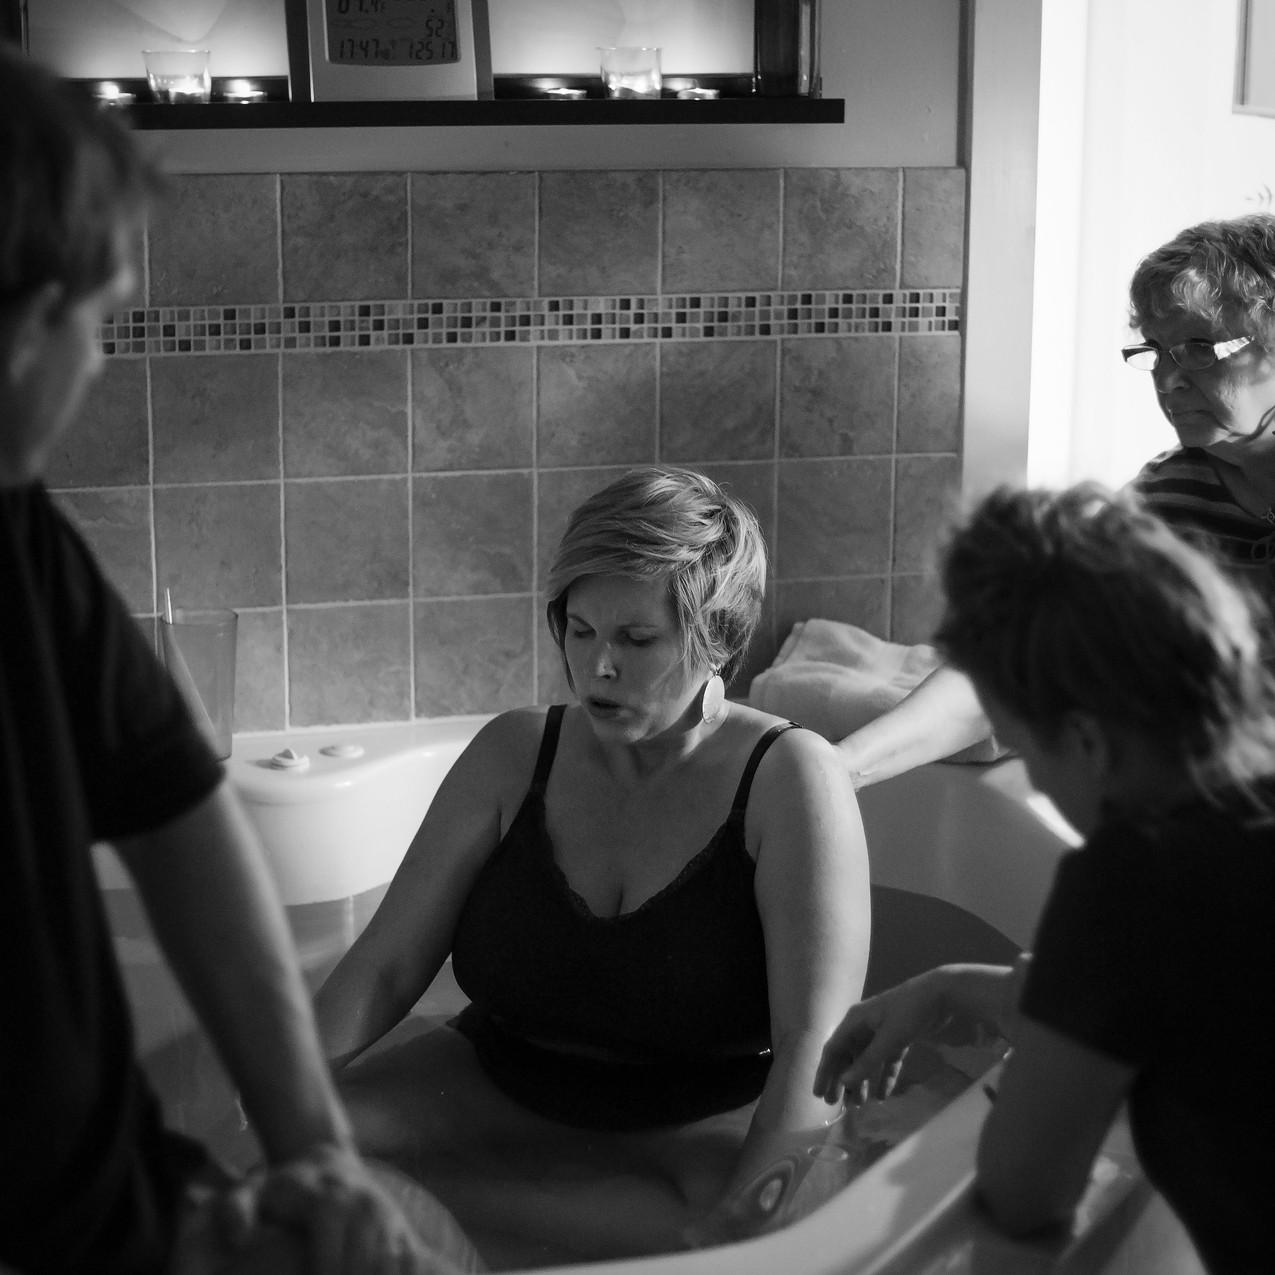 TampaBirthPhotographerLaborOfLoveBirthCenterLaborofLovebirthcenterTampaTampa Birth Photographer Tampa newborn Photographer in water birth Labor of love Lutz Fl_Jan252017_0049 copy